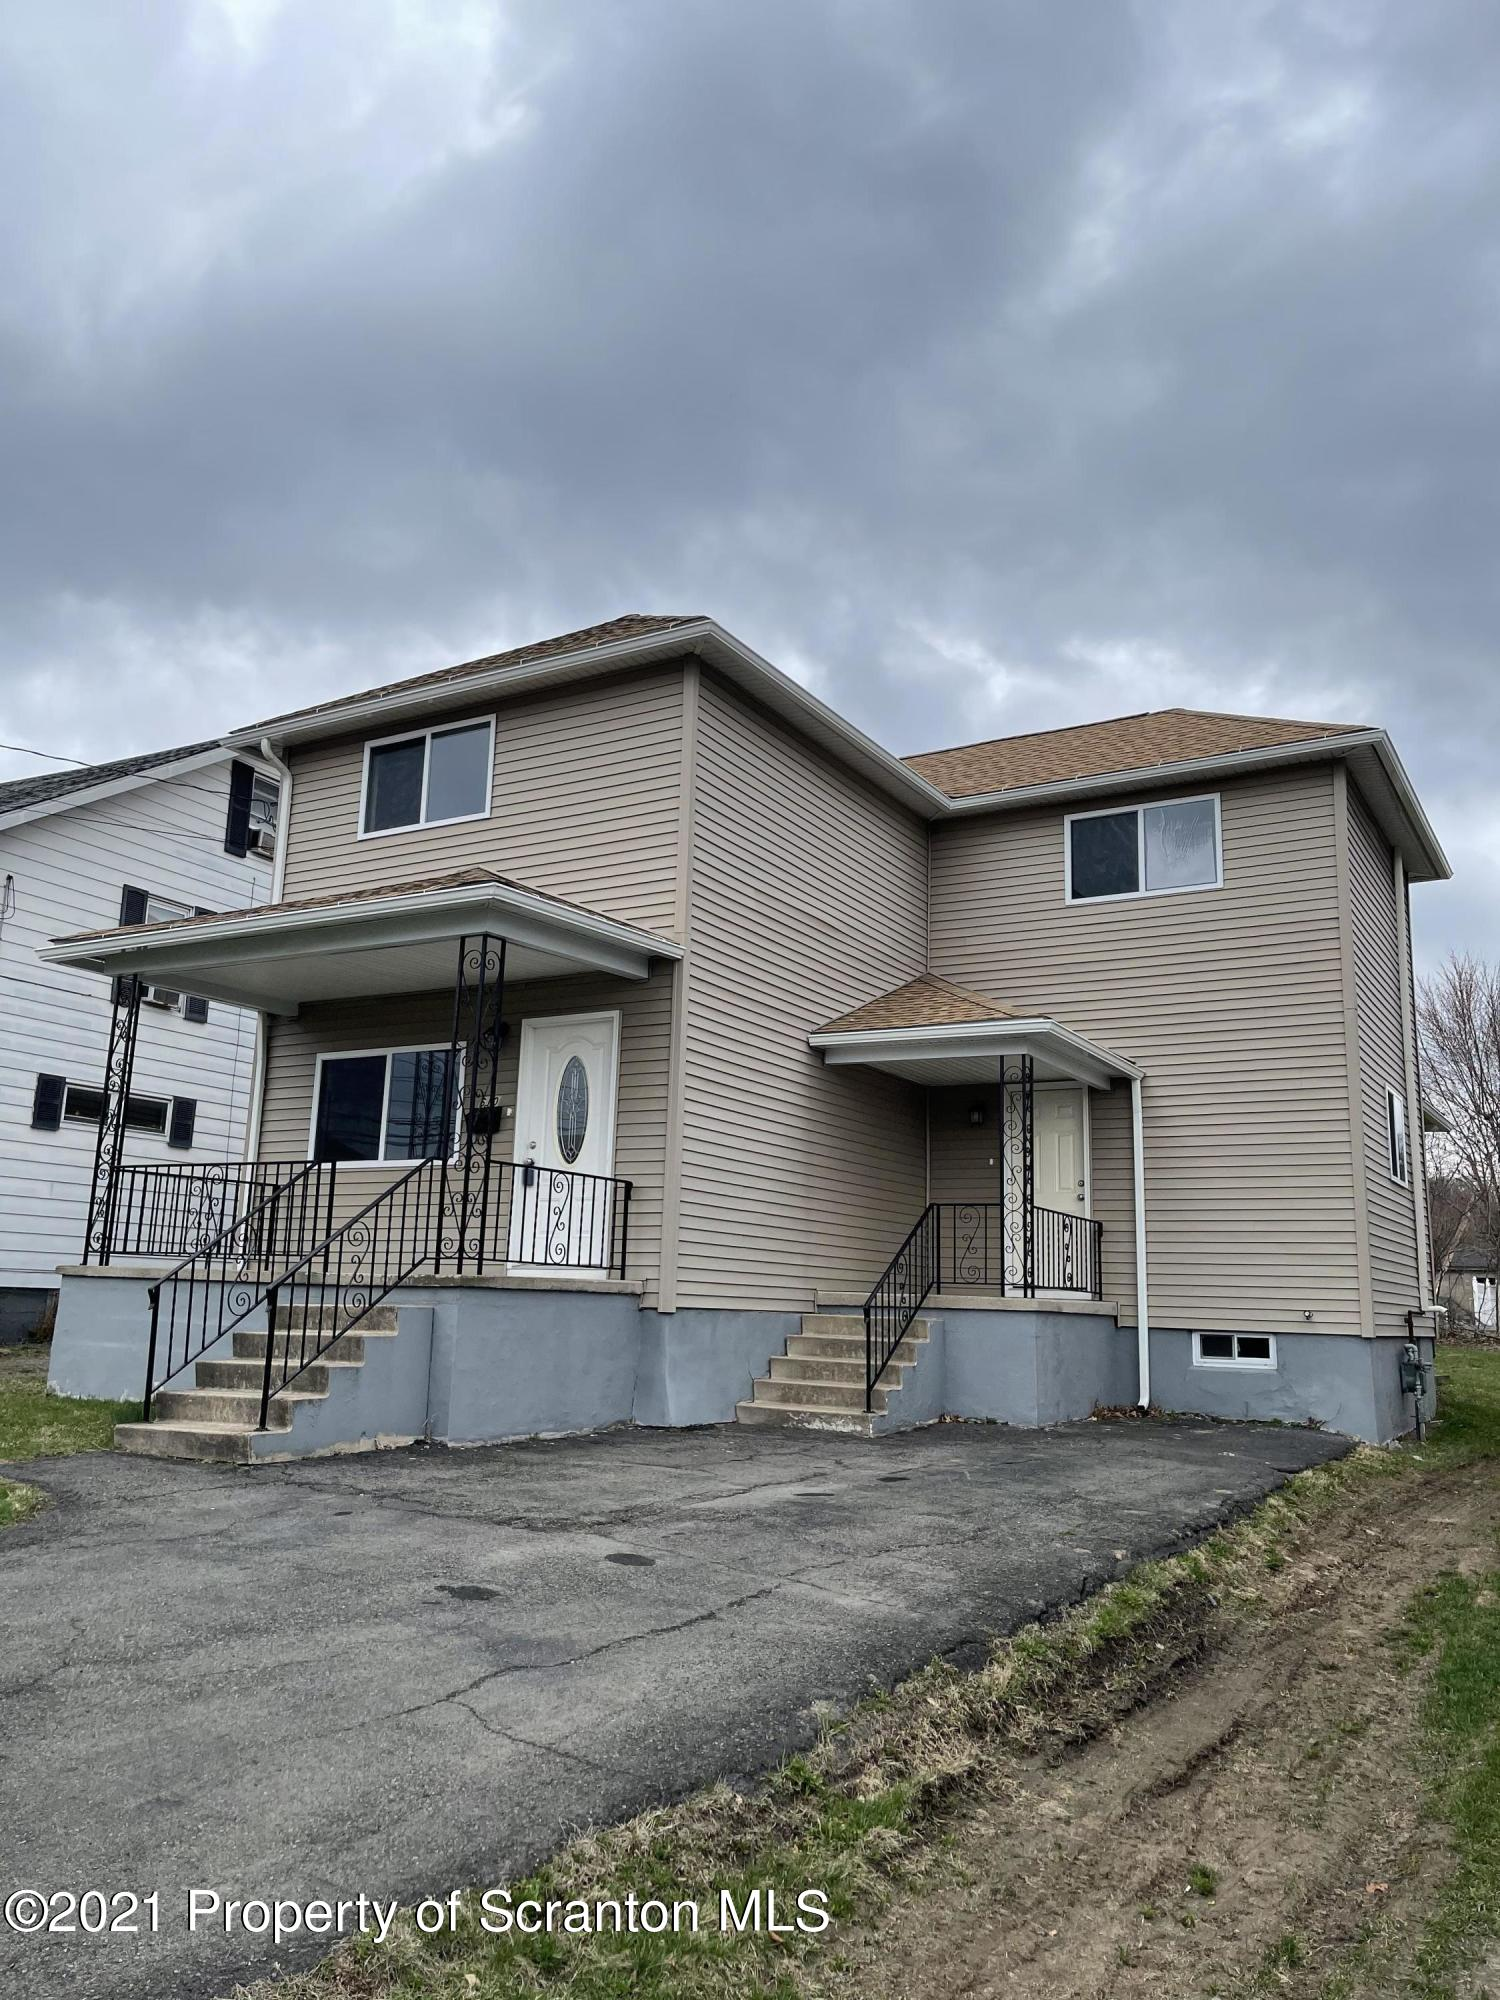 610 Keystone St, Peckville, Pennsylvania 18452, 3 Bedrooms Bedrooms, 6 Rooms Rooms,2 BathroomsBathrooms,Single Family,For Sale,Keystone,21-1070